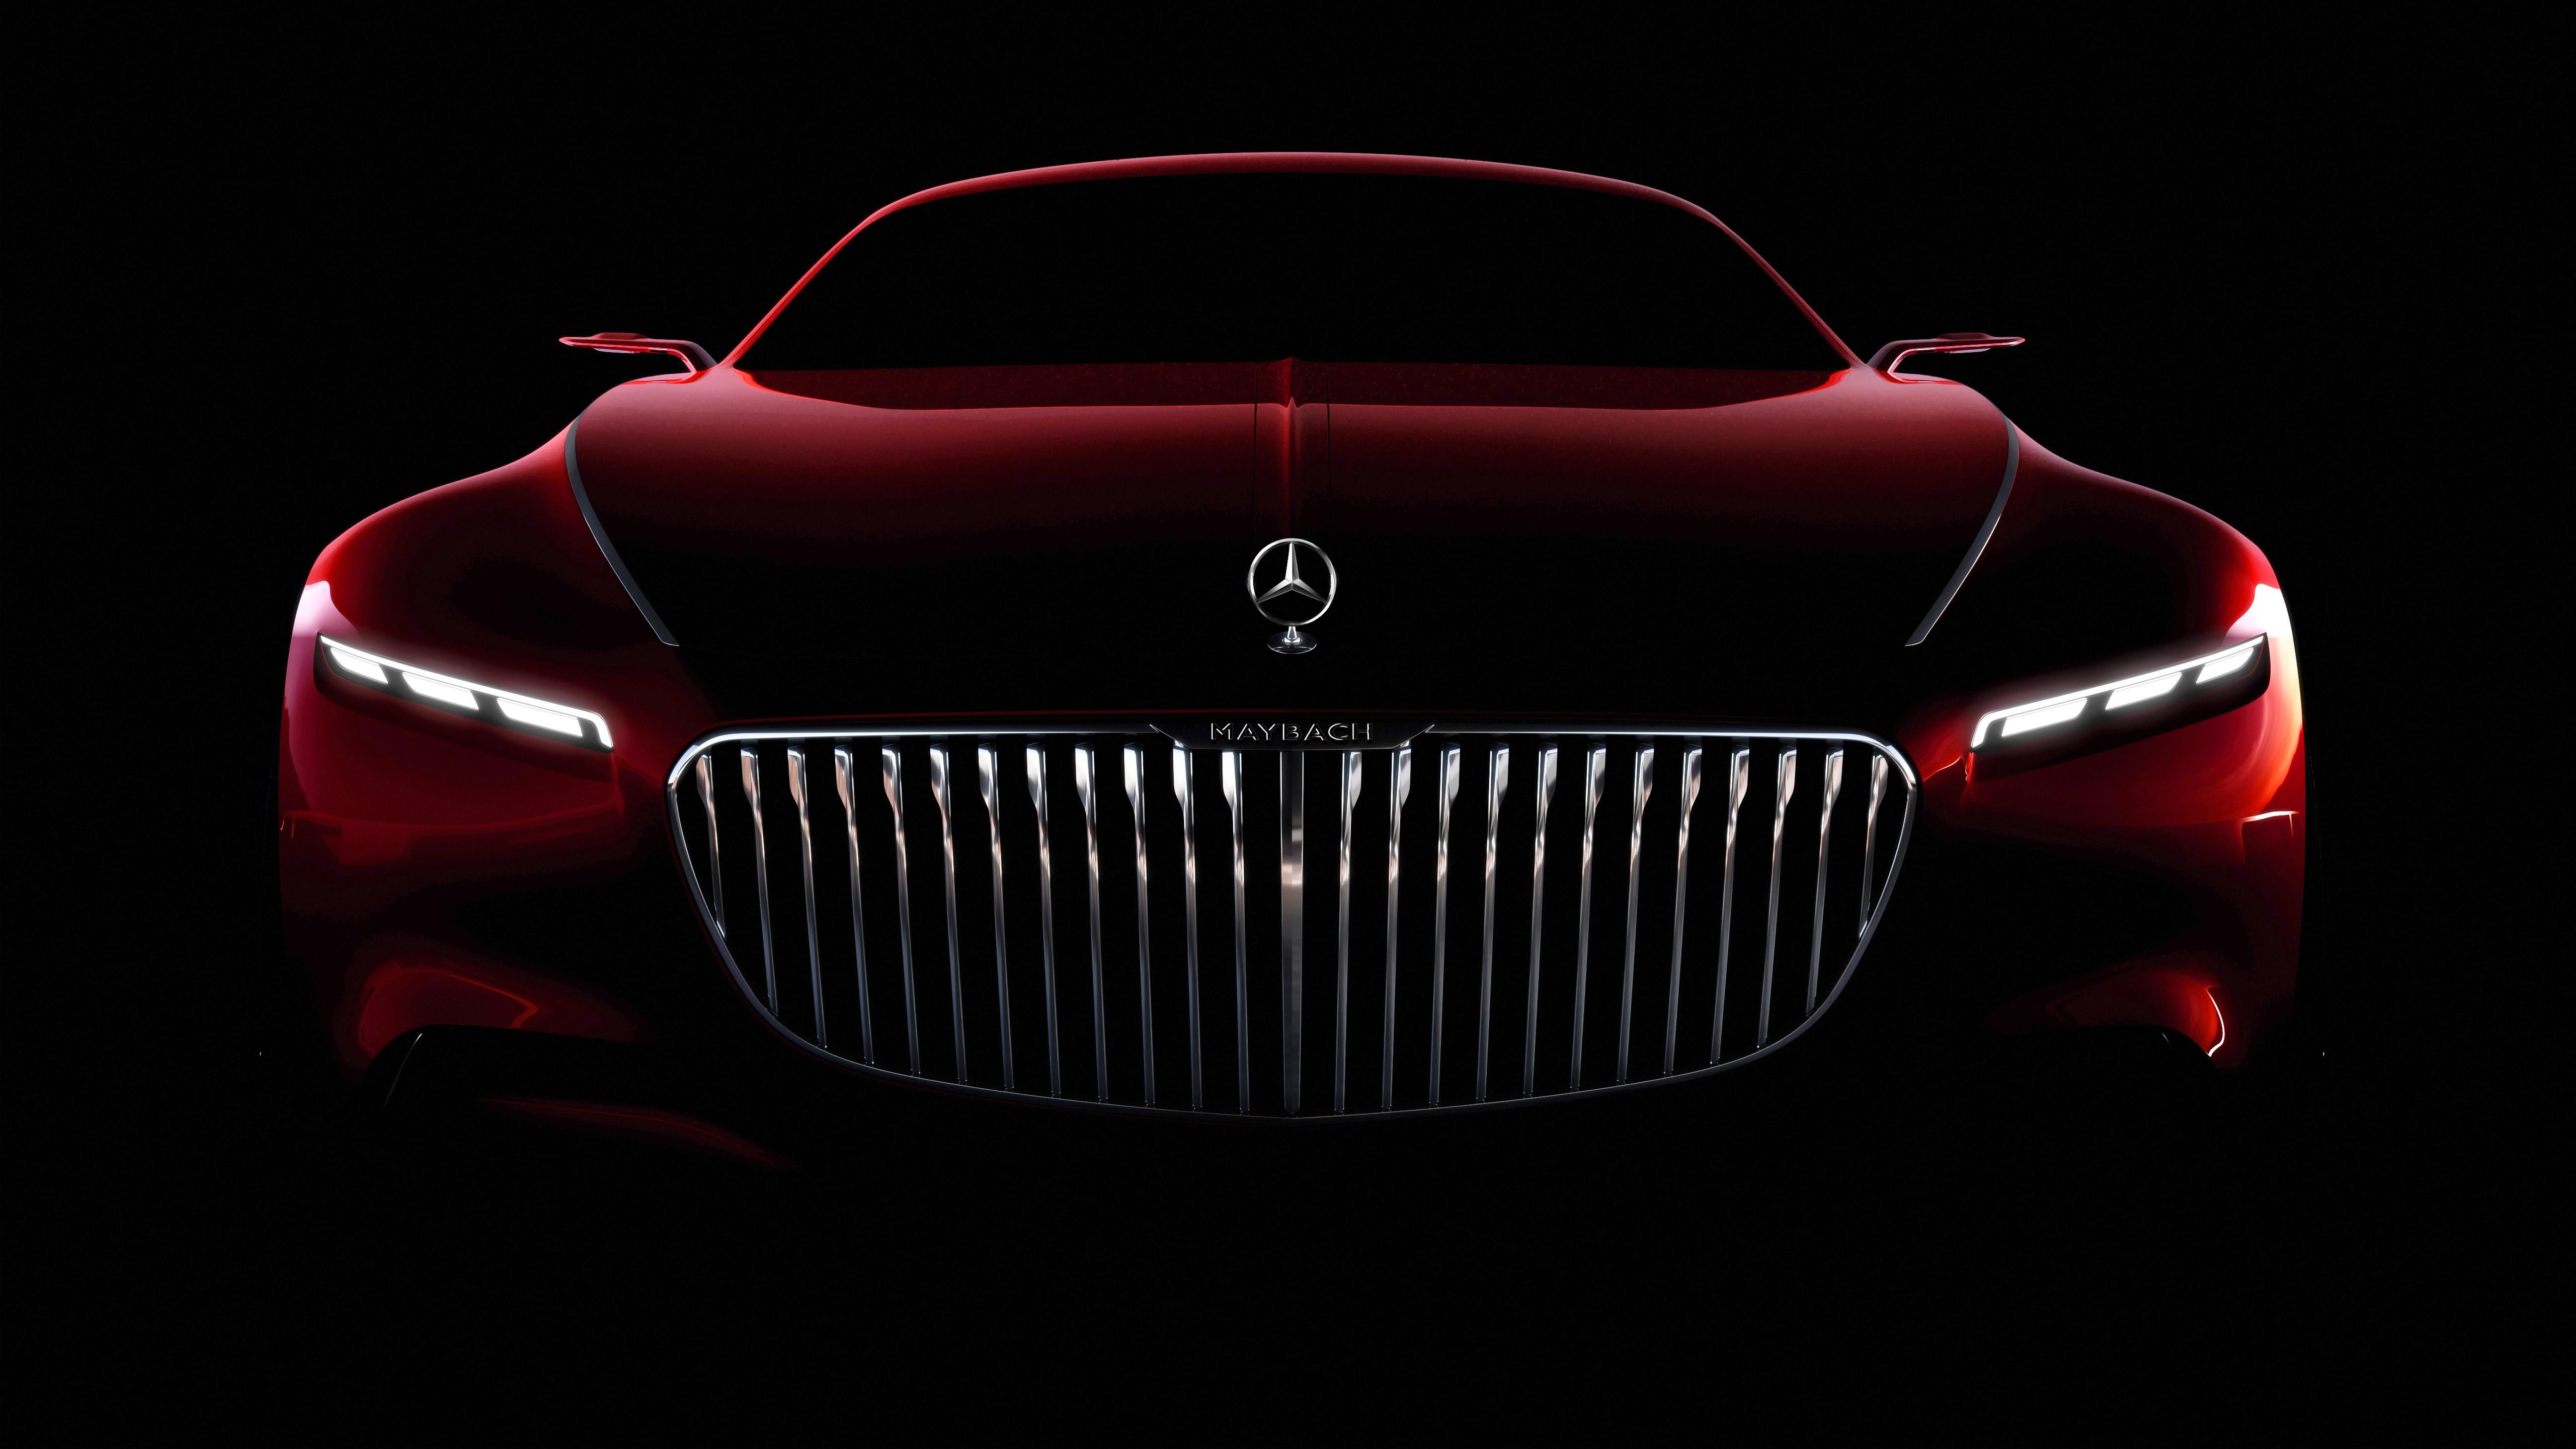 Vision Mercedes Maybach 6 Coupe 5K Wallpaper HD Car 5120x2880